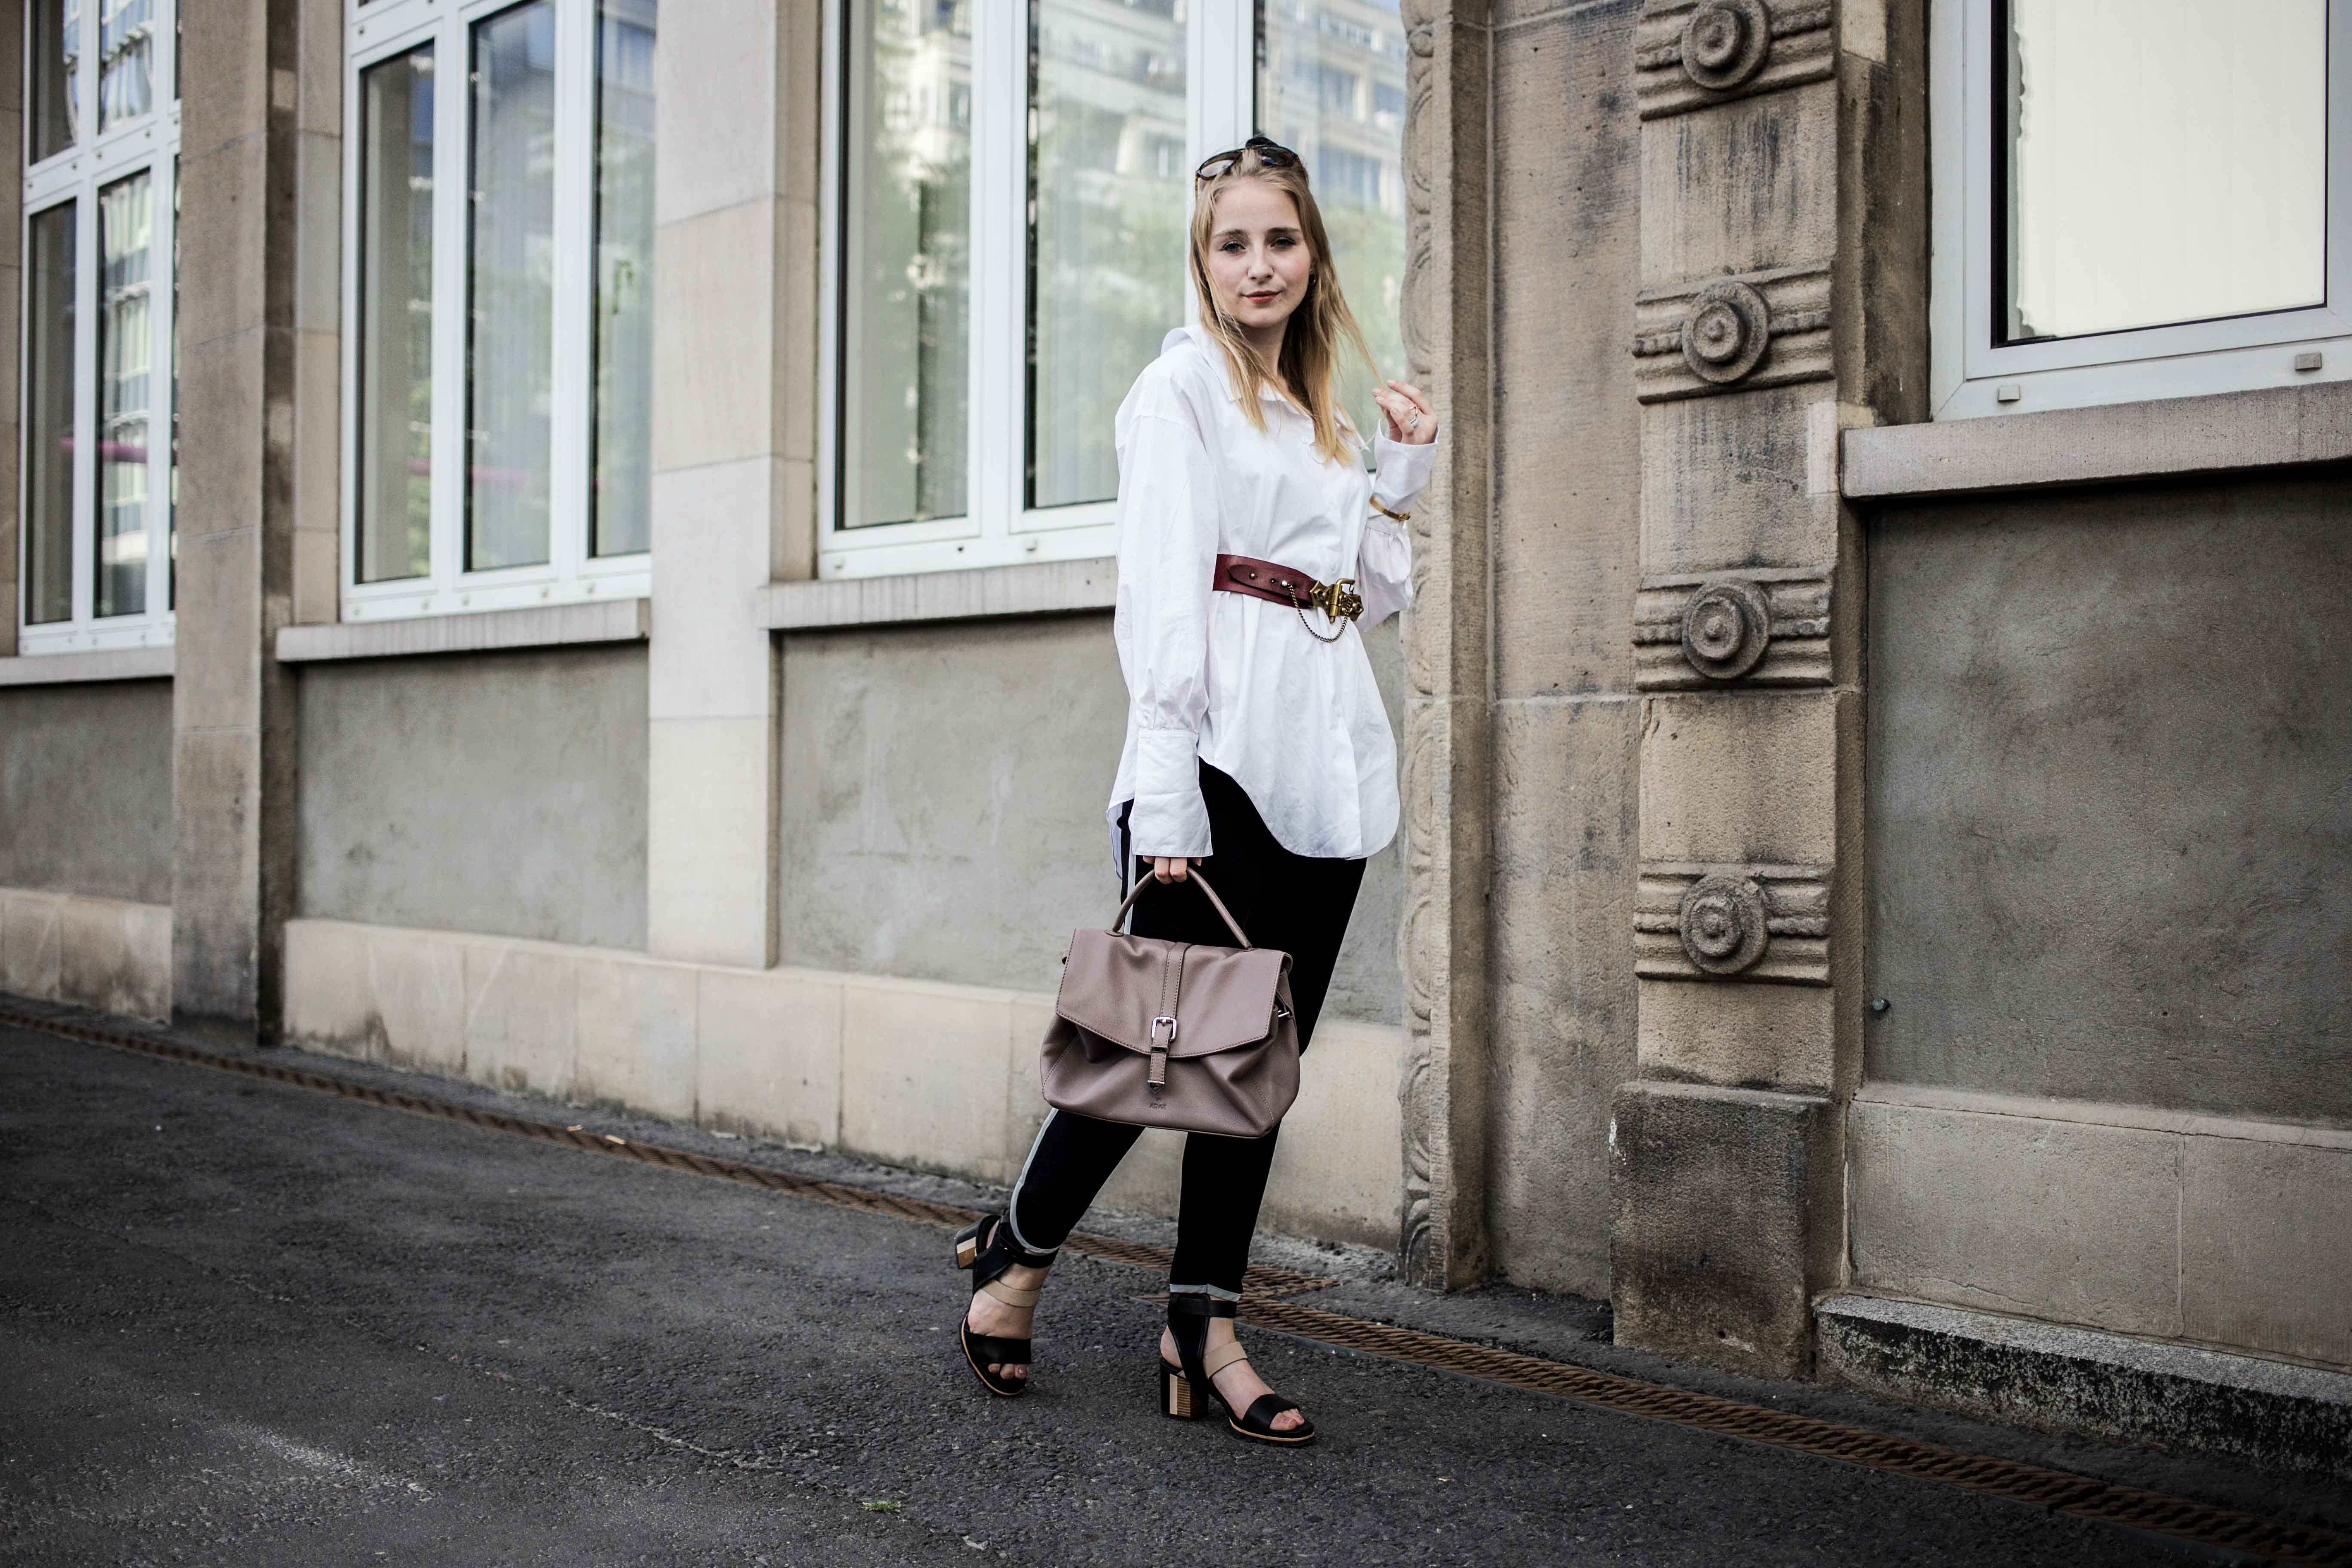 fashionweek-berlin-statement-gürtel-oversized-bluse-outfit-modeblog_6403